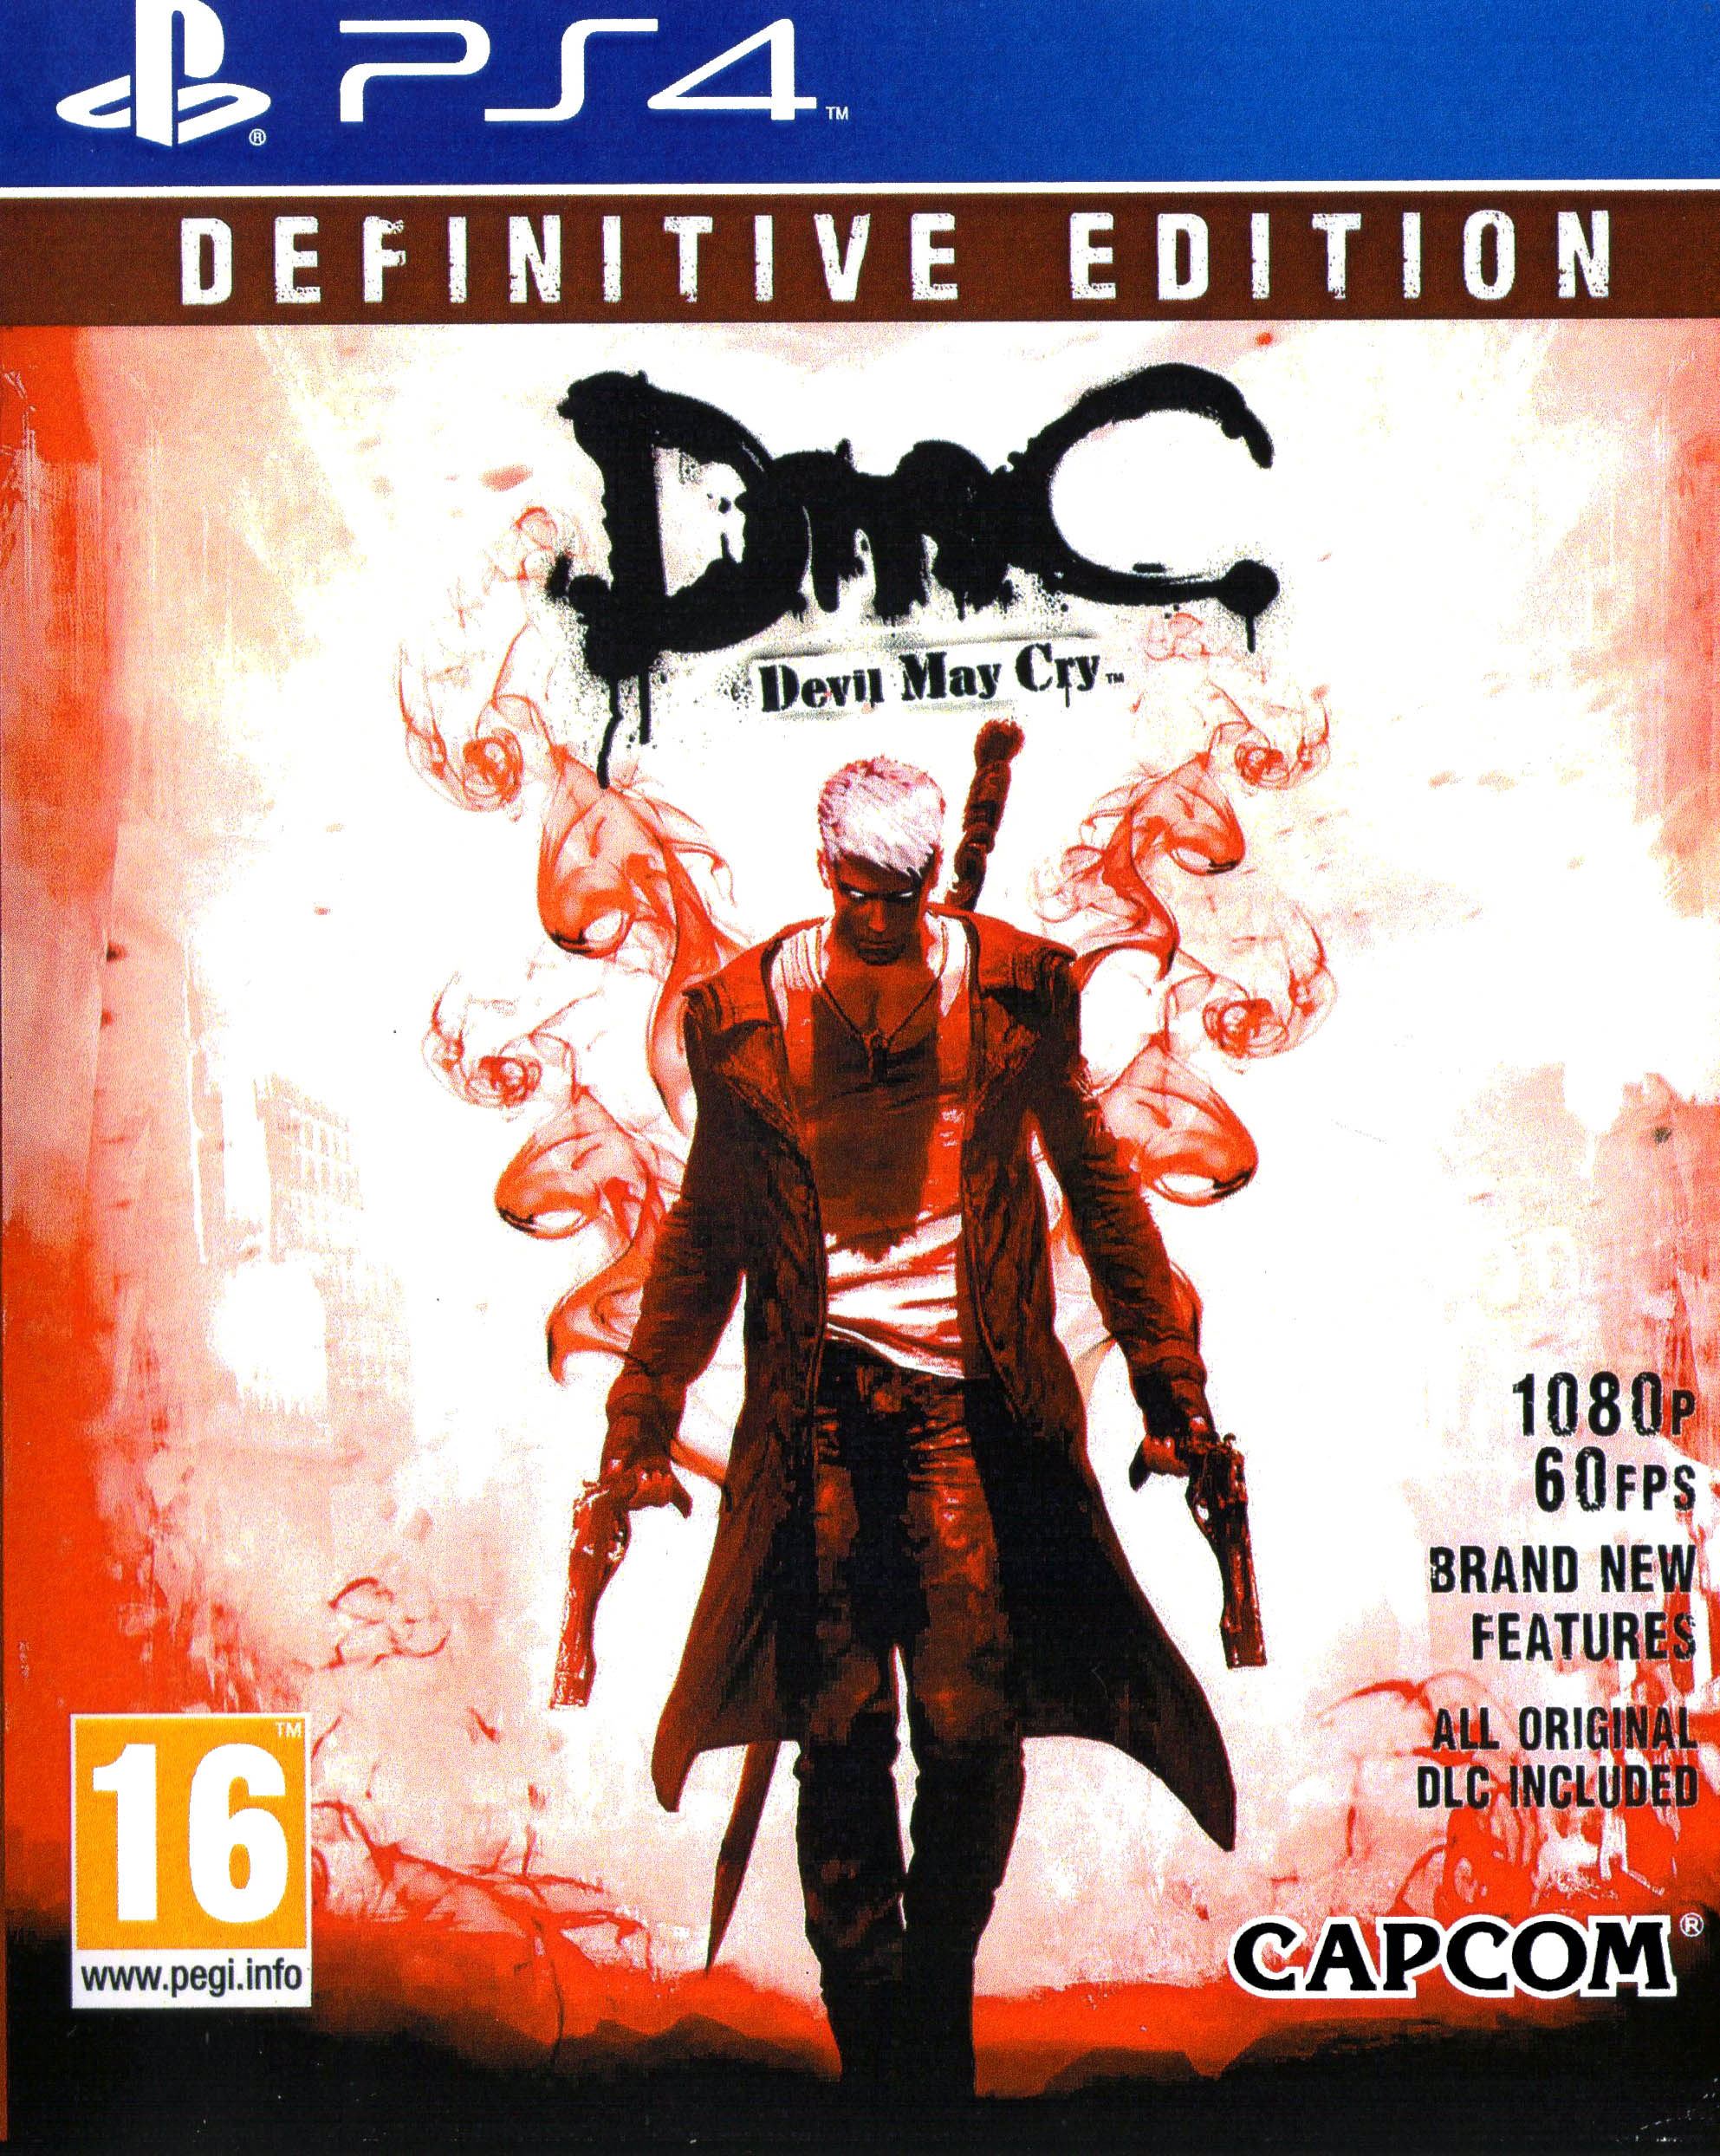 Sony-PLAYSTATION-DMC-DEVIL-CRY-DEFINITIVE-EDITION